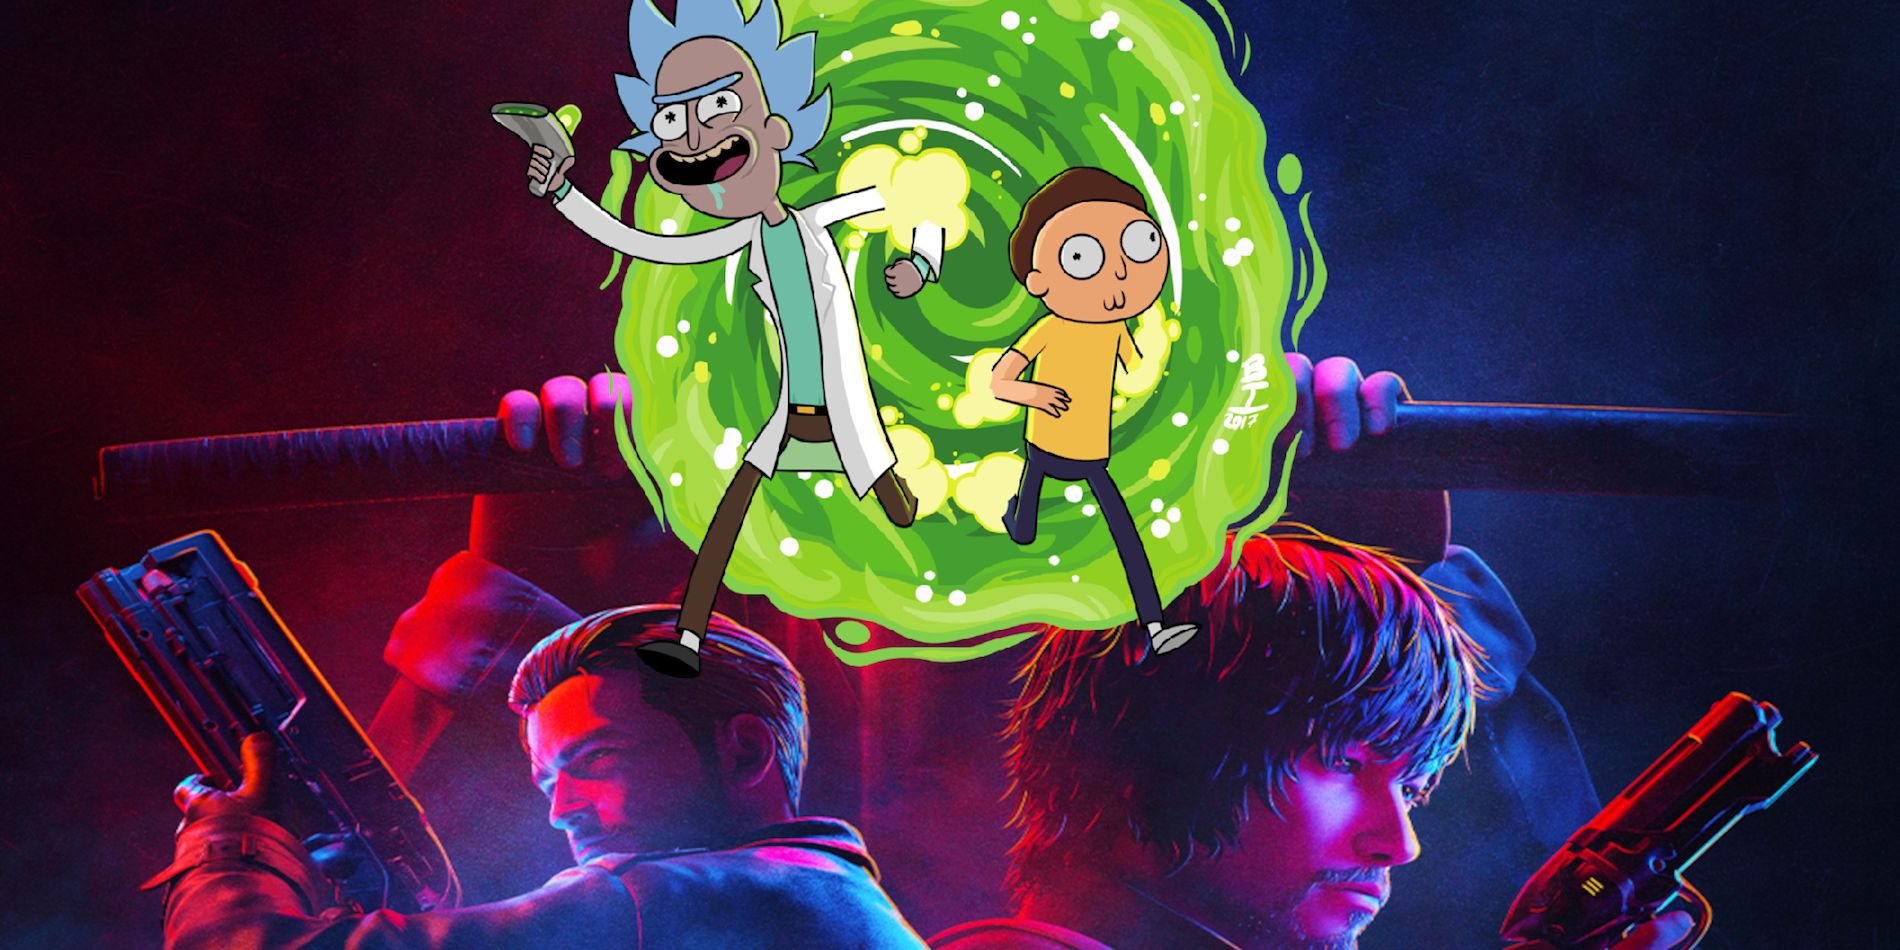 Adult Swim Festival 2021 Has Rick & Morty Panel, Live Streams & More